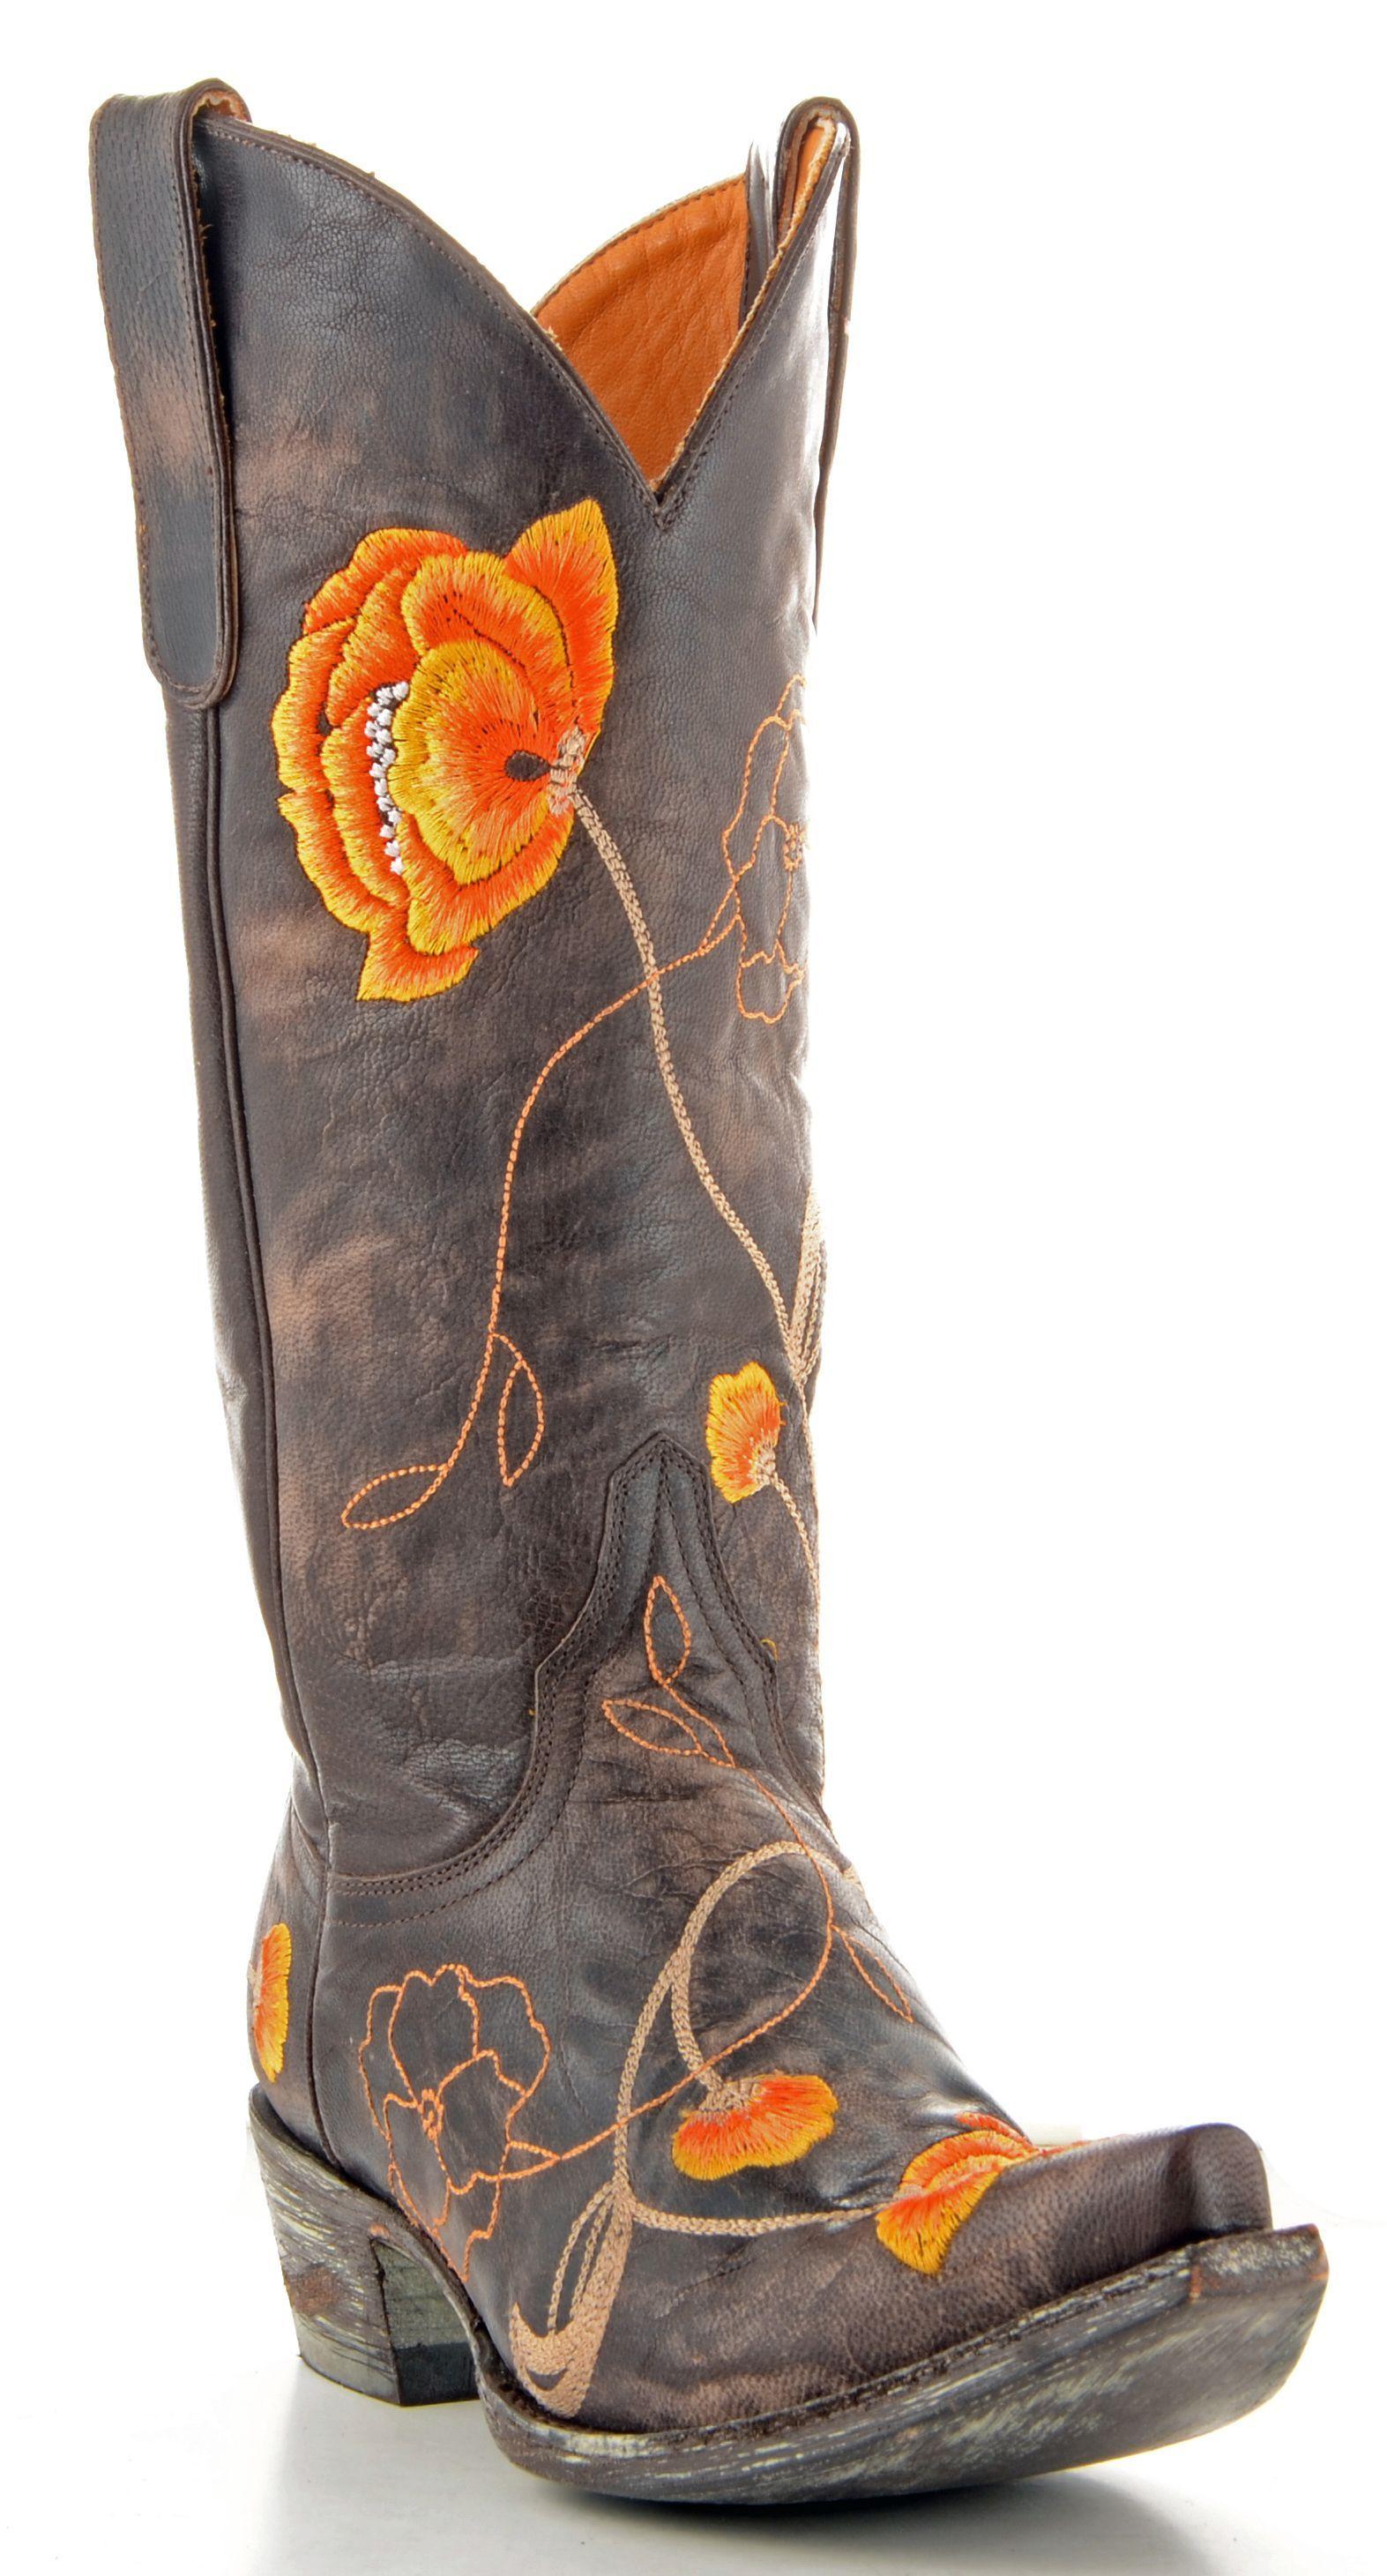 Womens Orange Cowboy Boots Coltford Boots